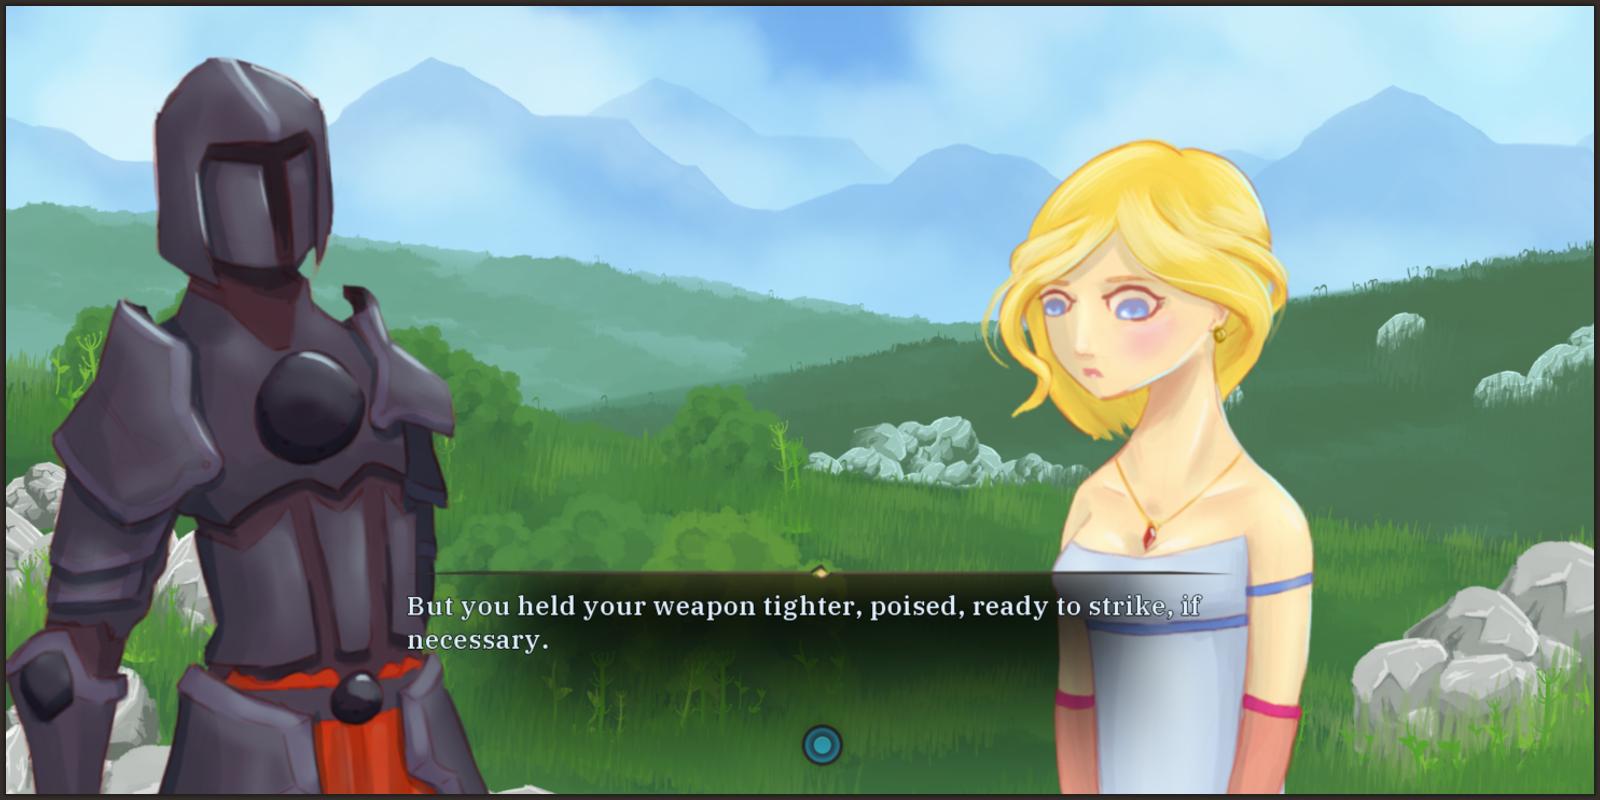 progress - 21 black knight dialogue